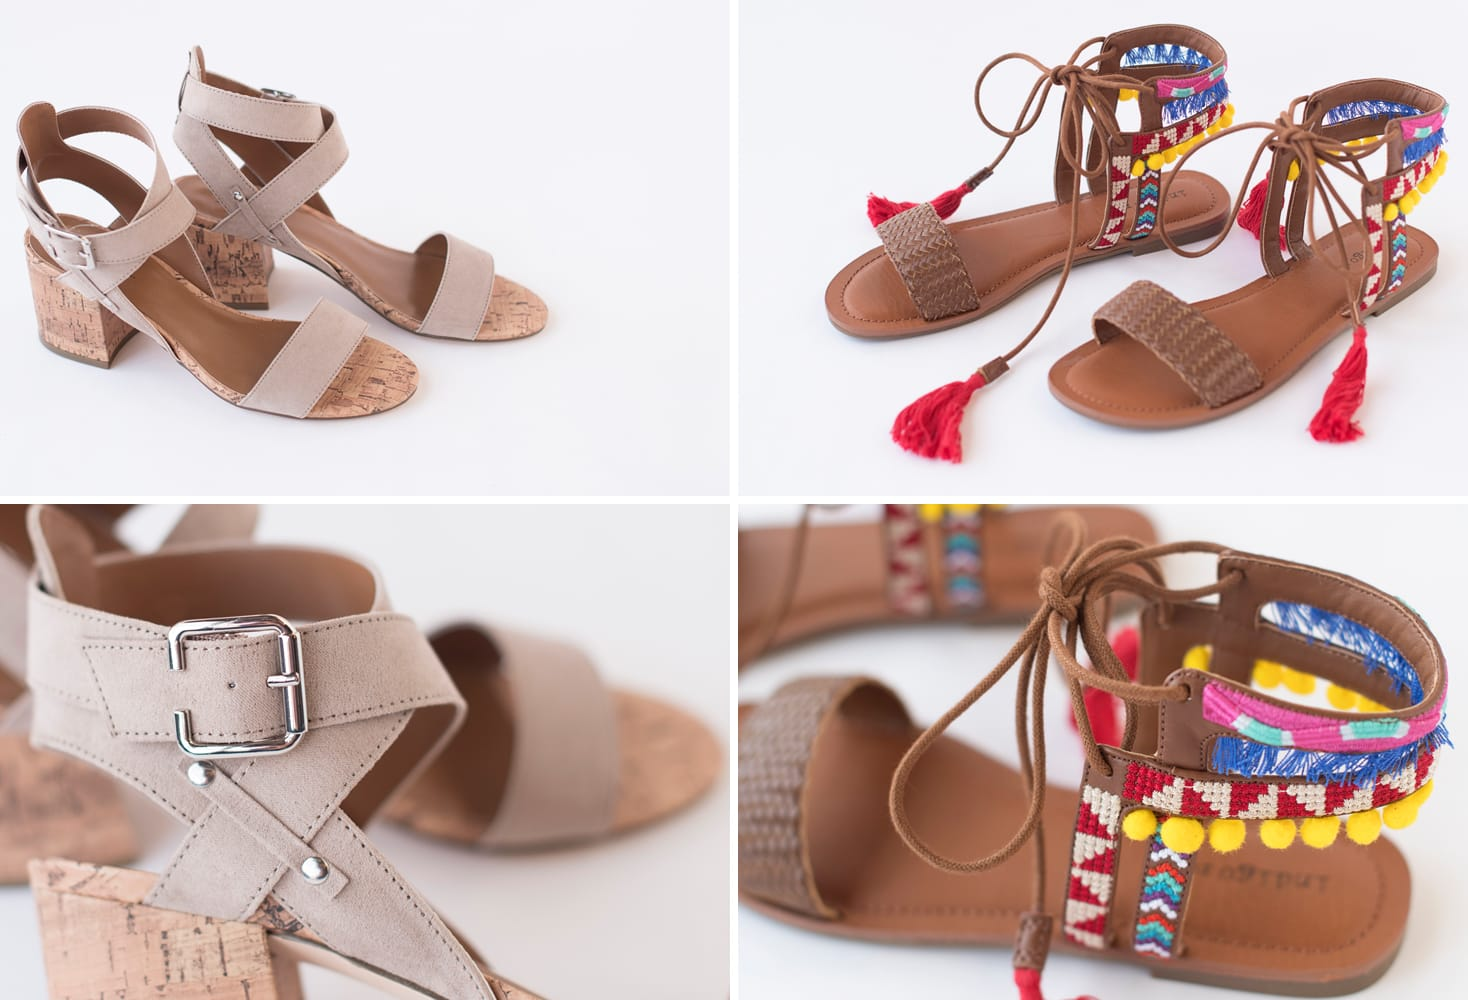 Indigo Rd Sandals & More